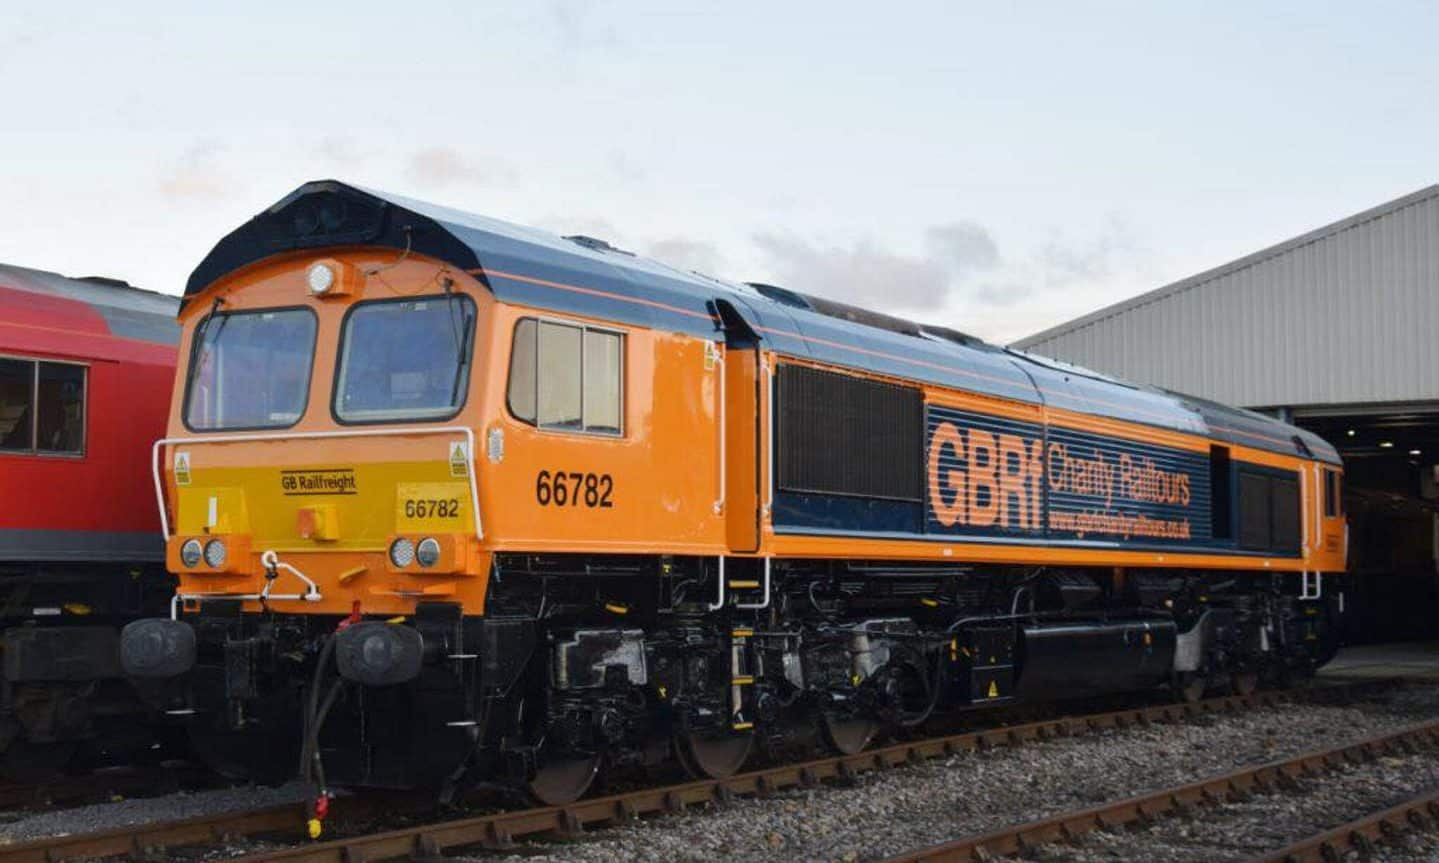 66783 // Credit GB Railfreight